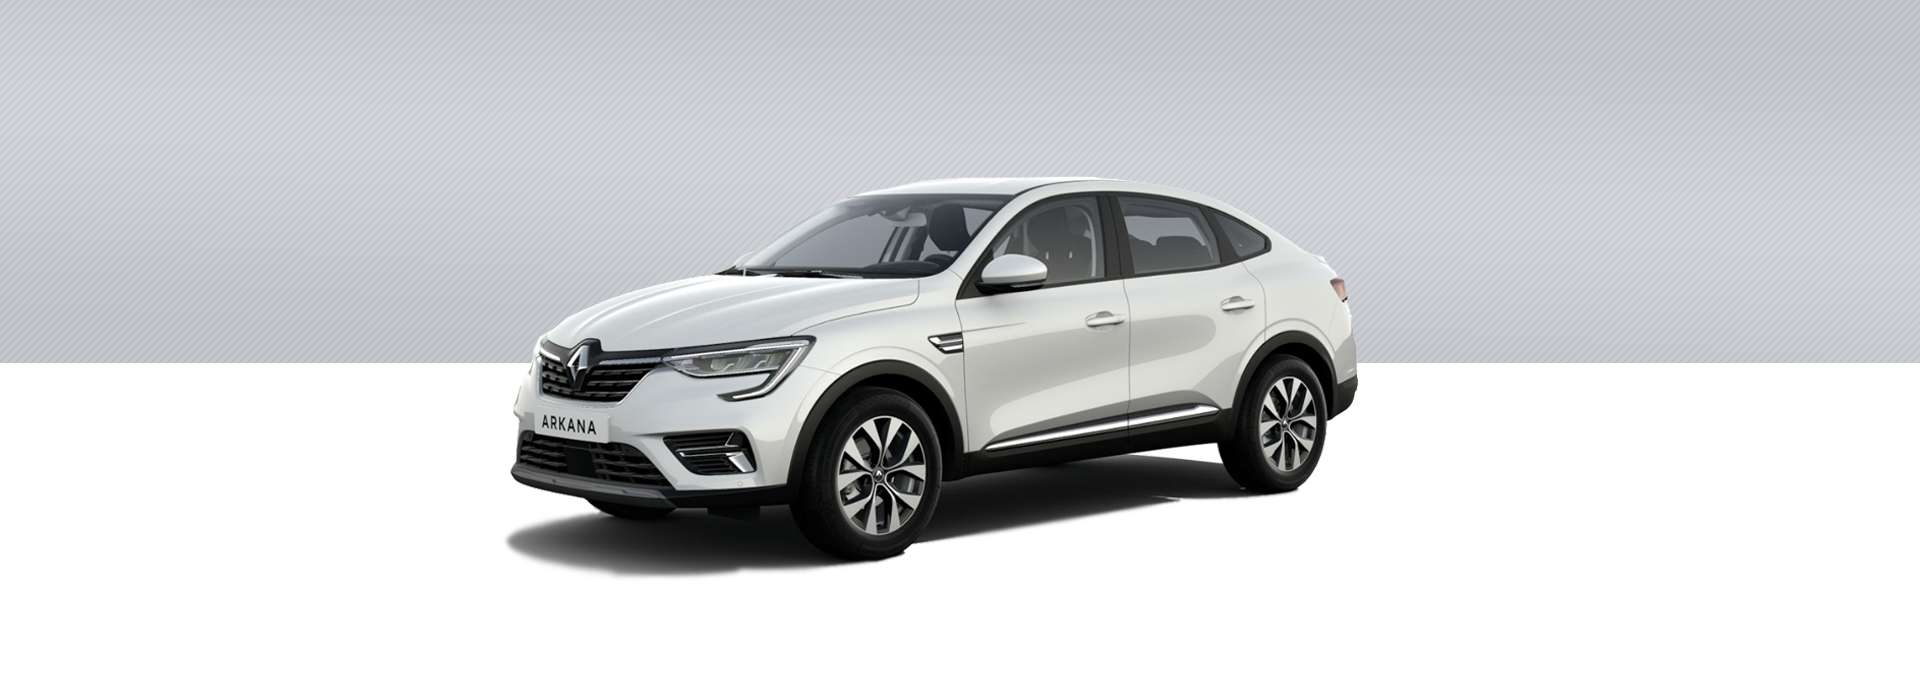 Renault NUEVO ARKANA E-TECH